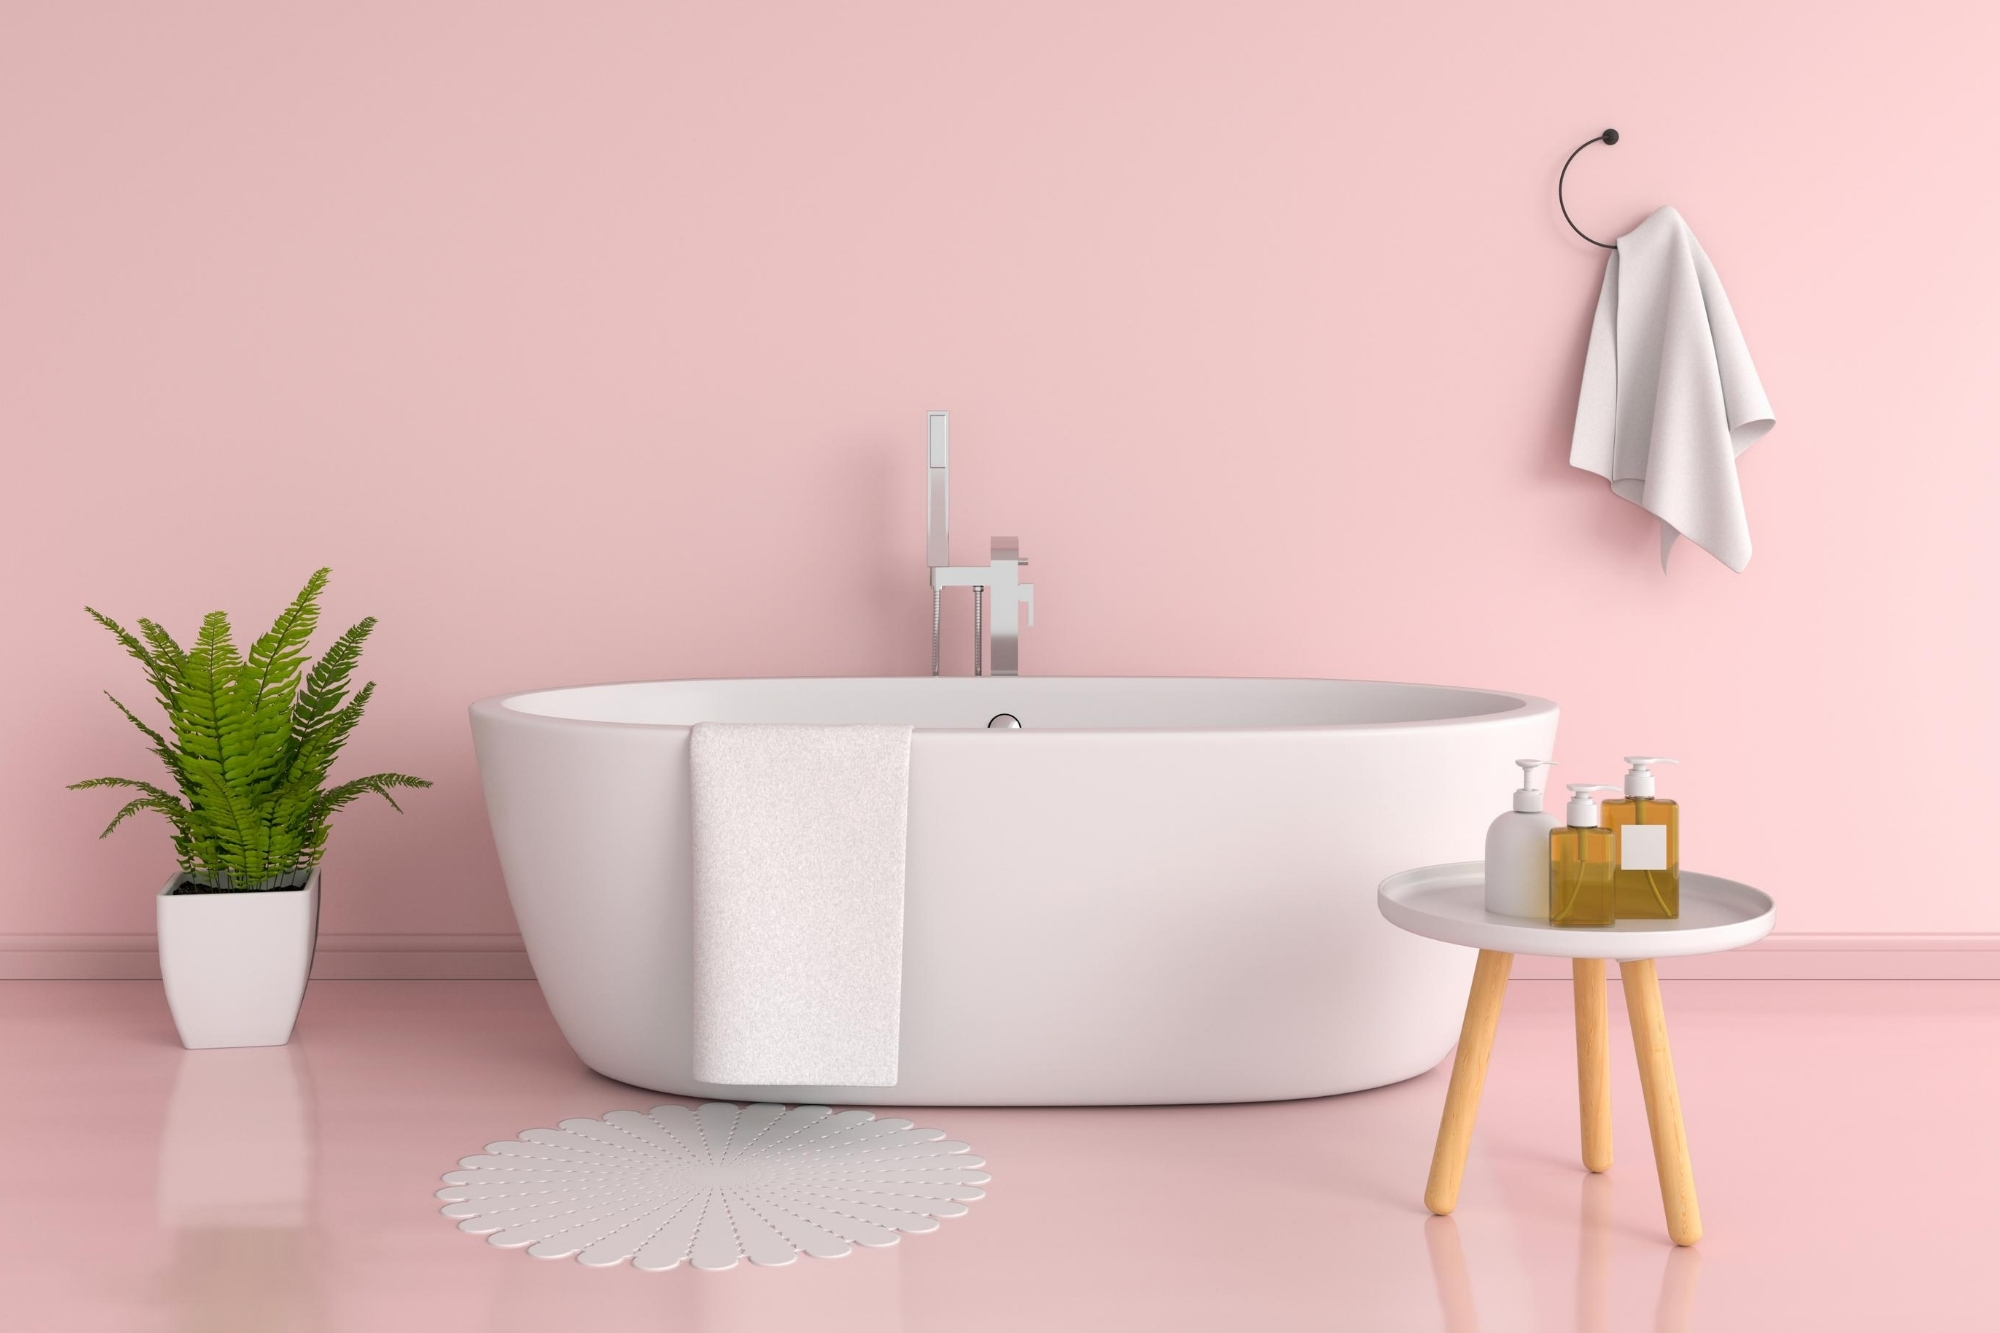 How to Plumb a Bathtub Shower